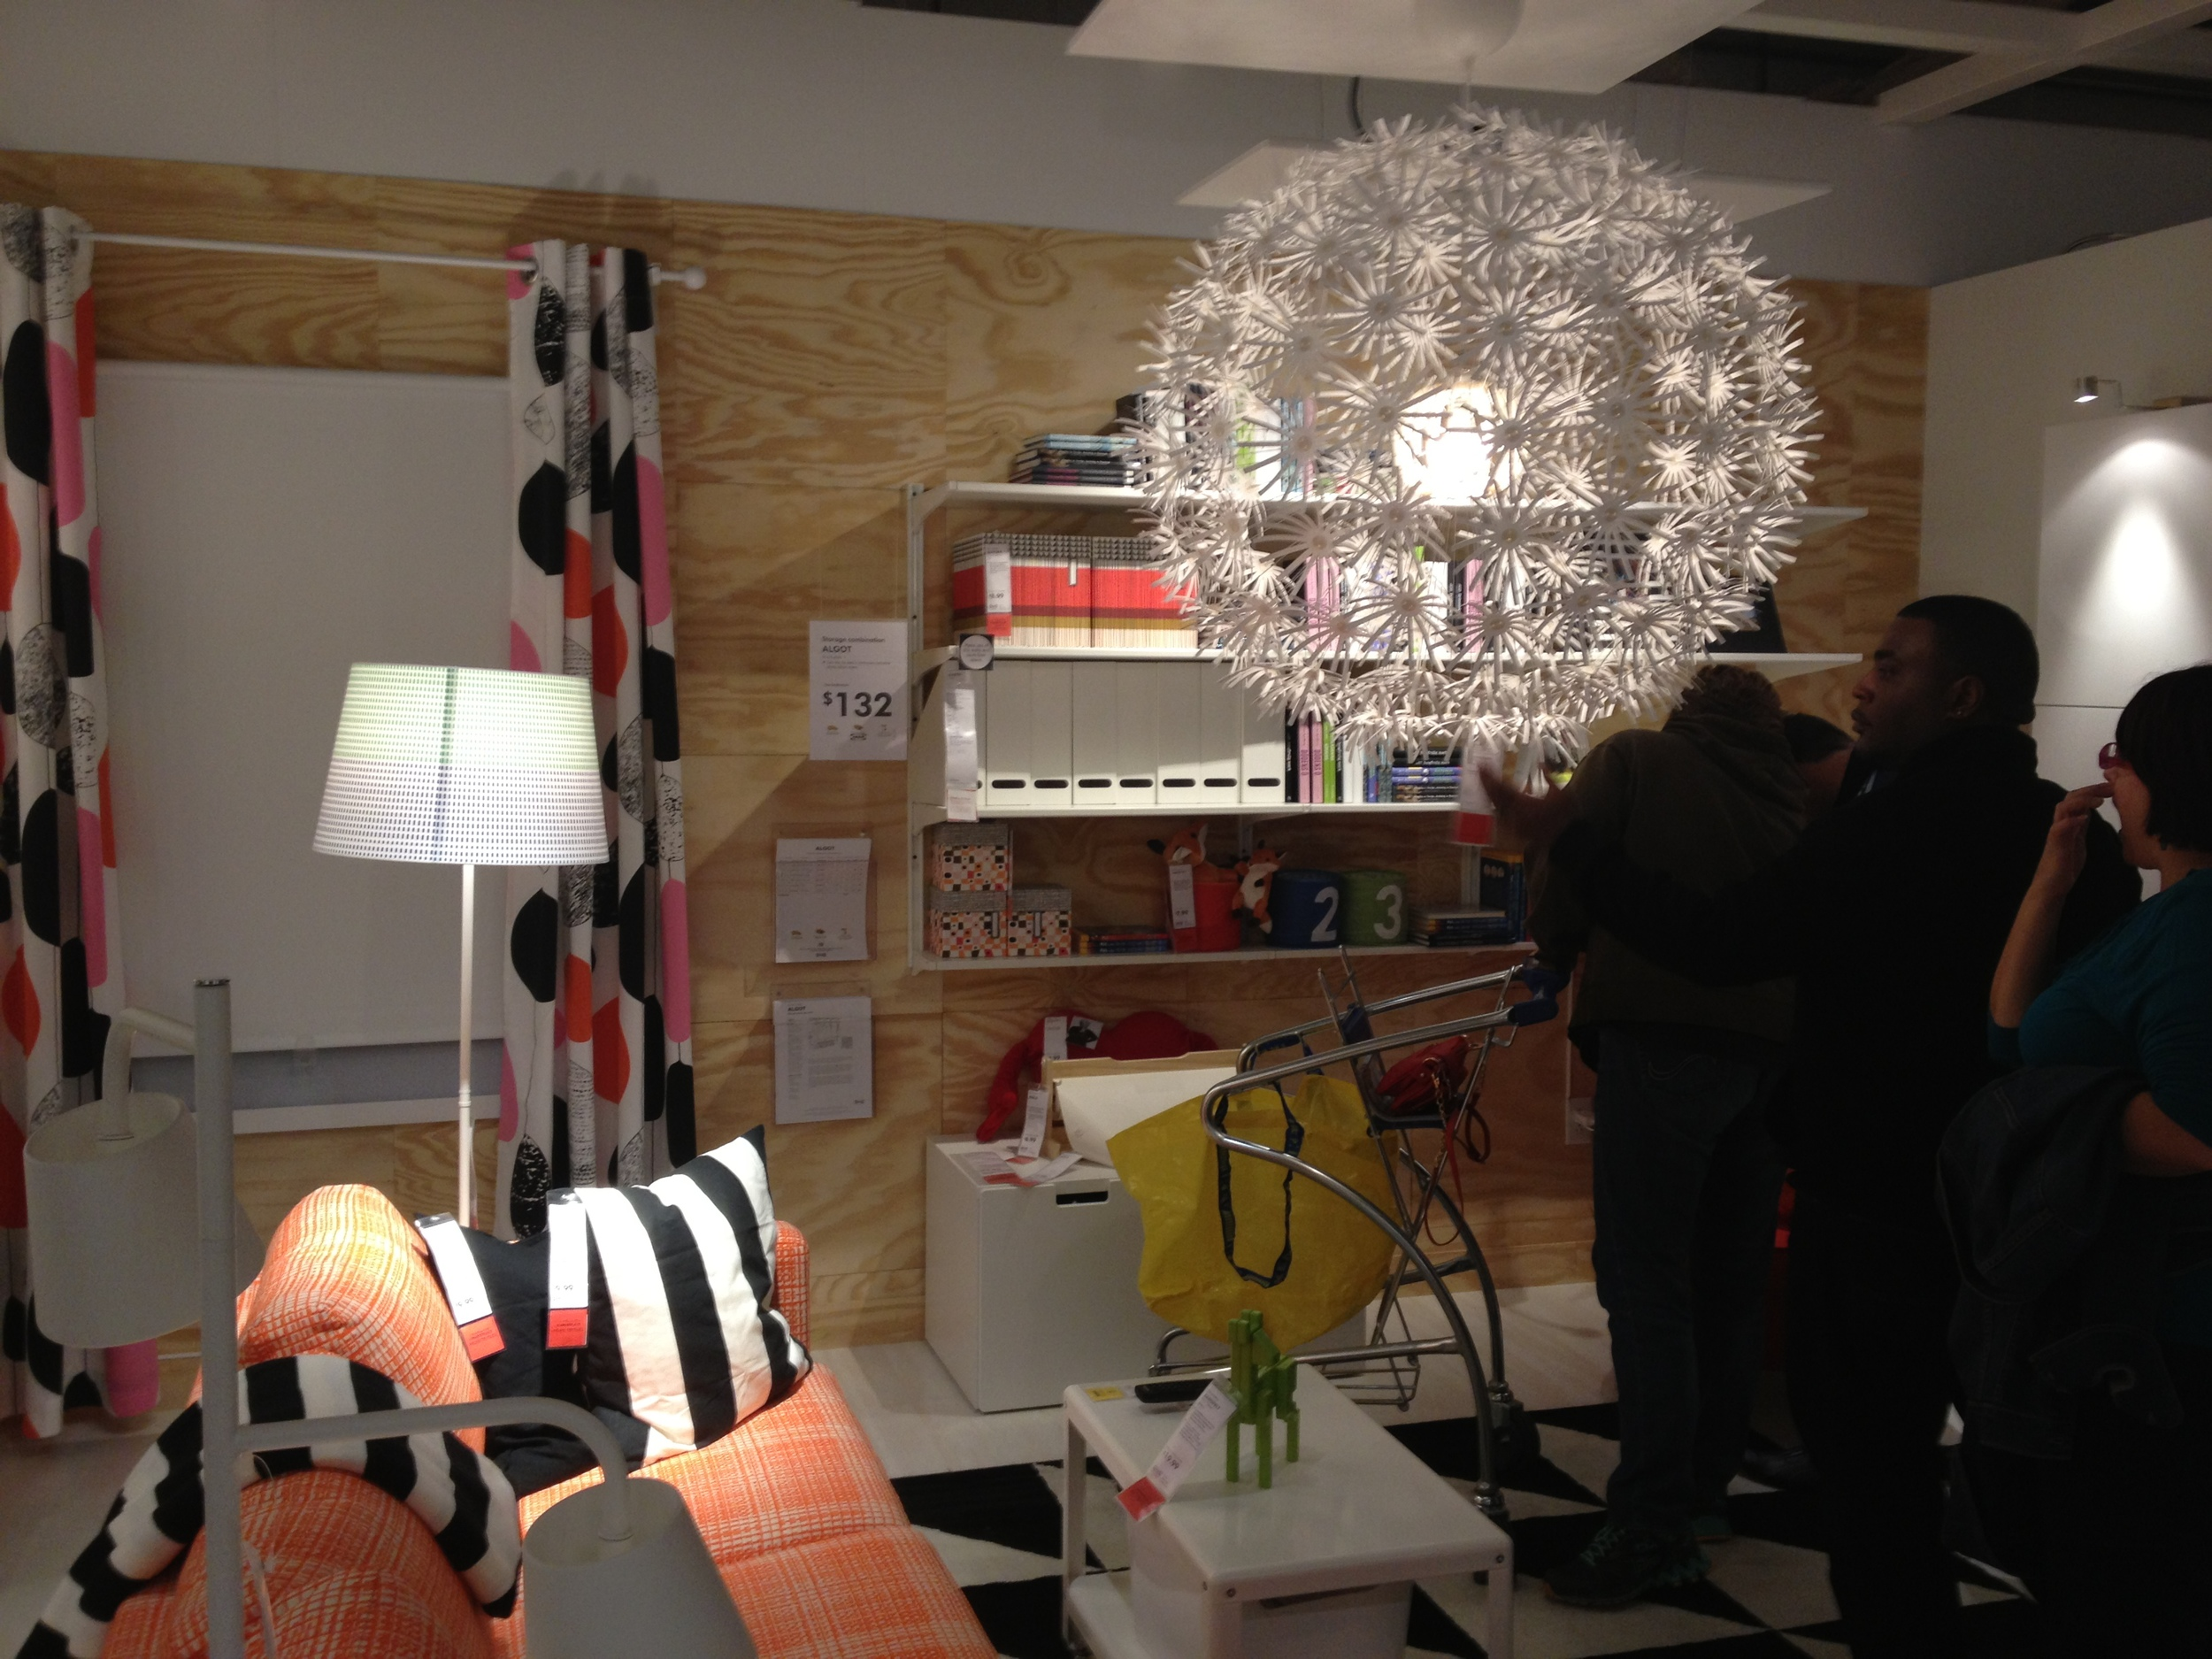 The iconic IKEA light.